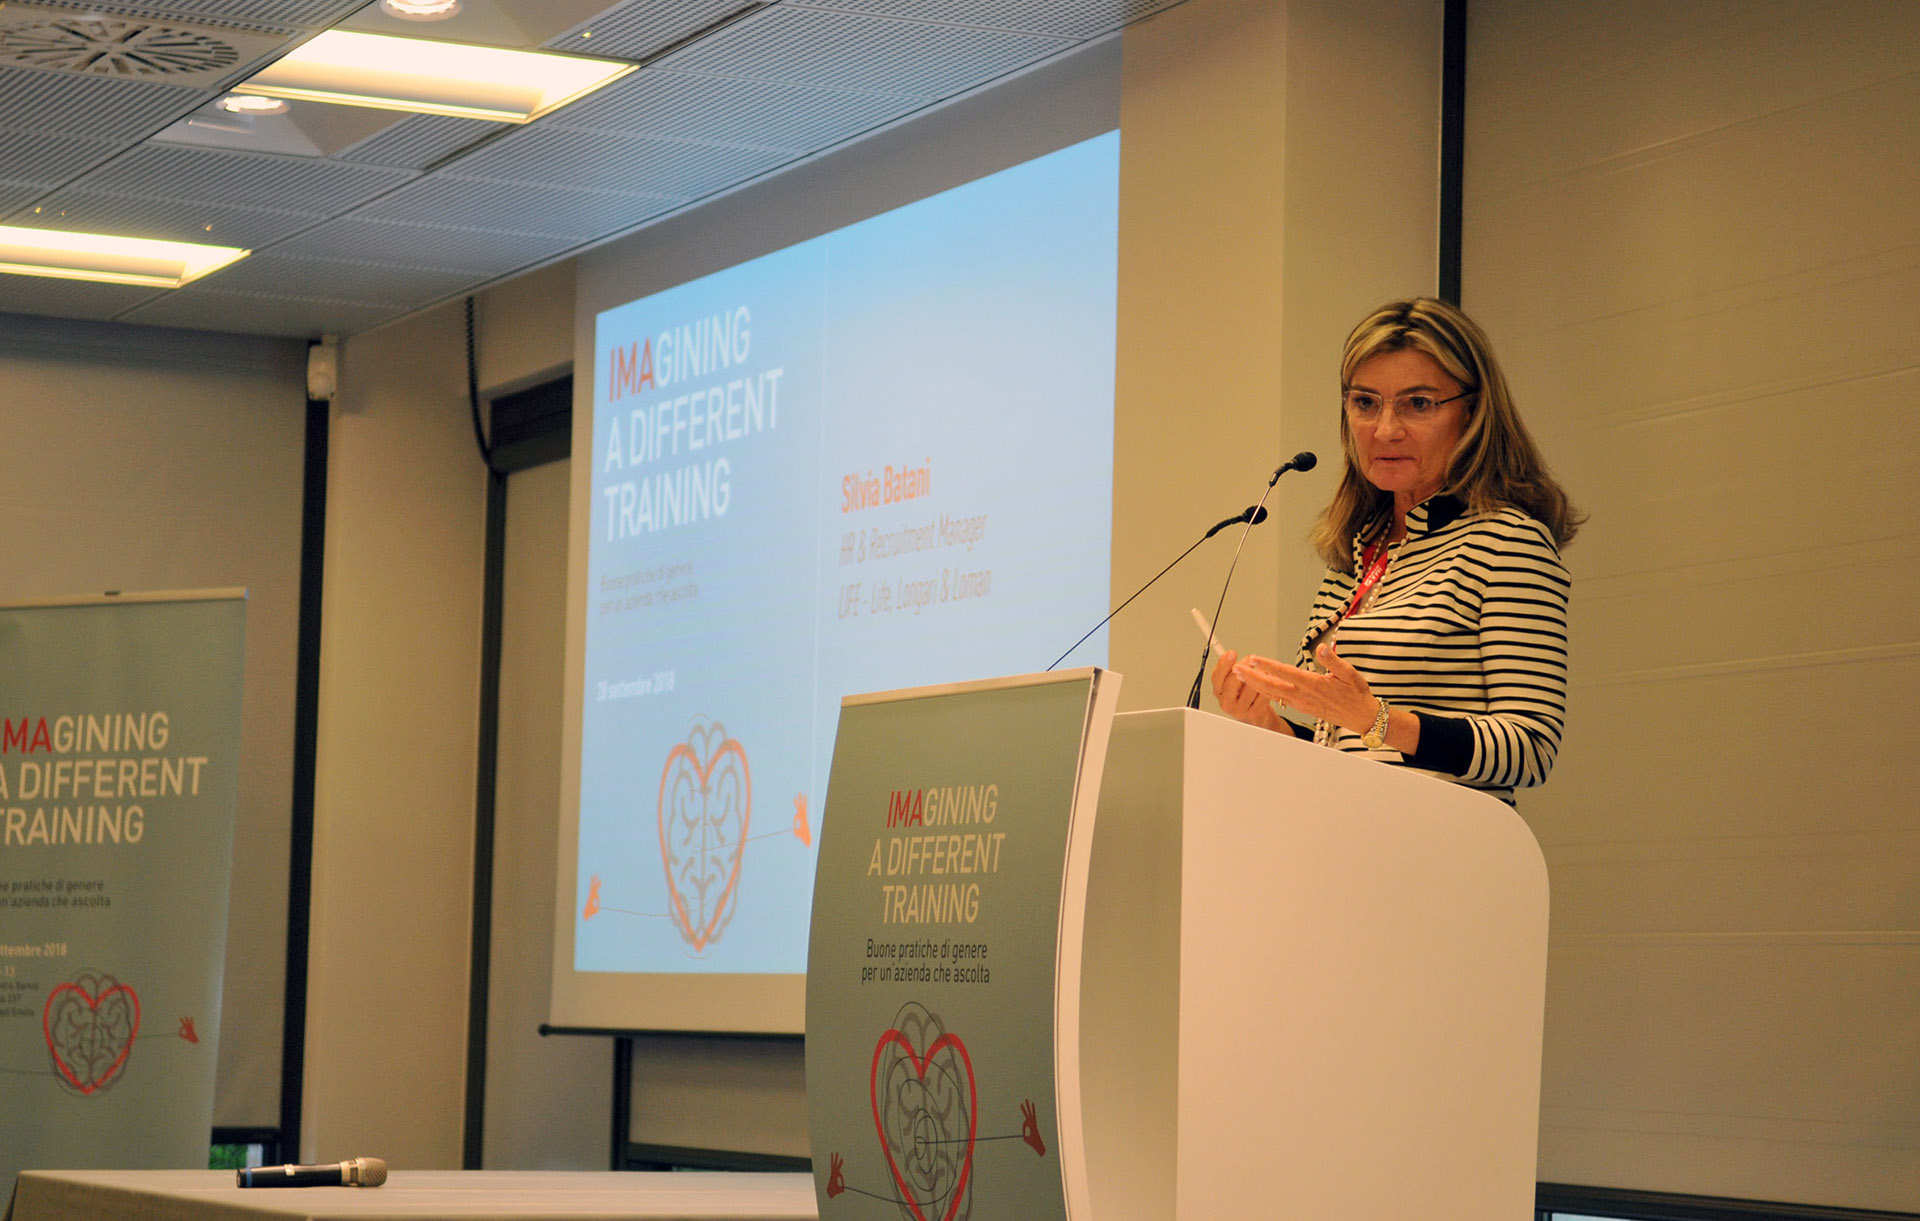 Silvia Batani, HR & Recruitment Manager, LIFE - Life, Longari & Loman